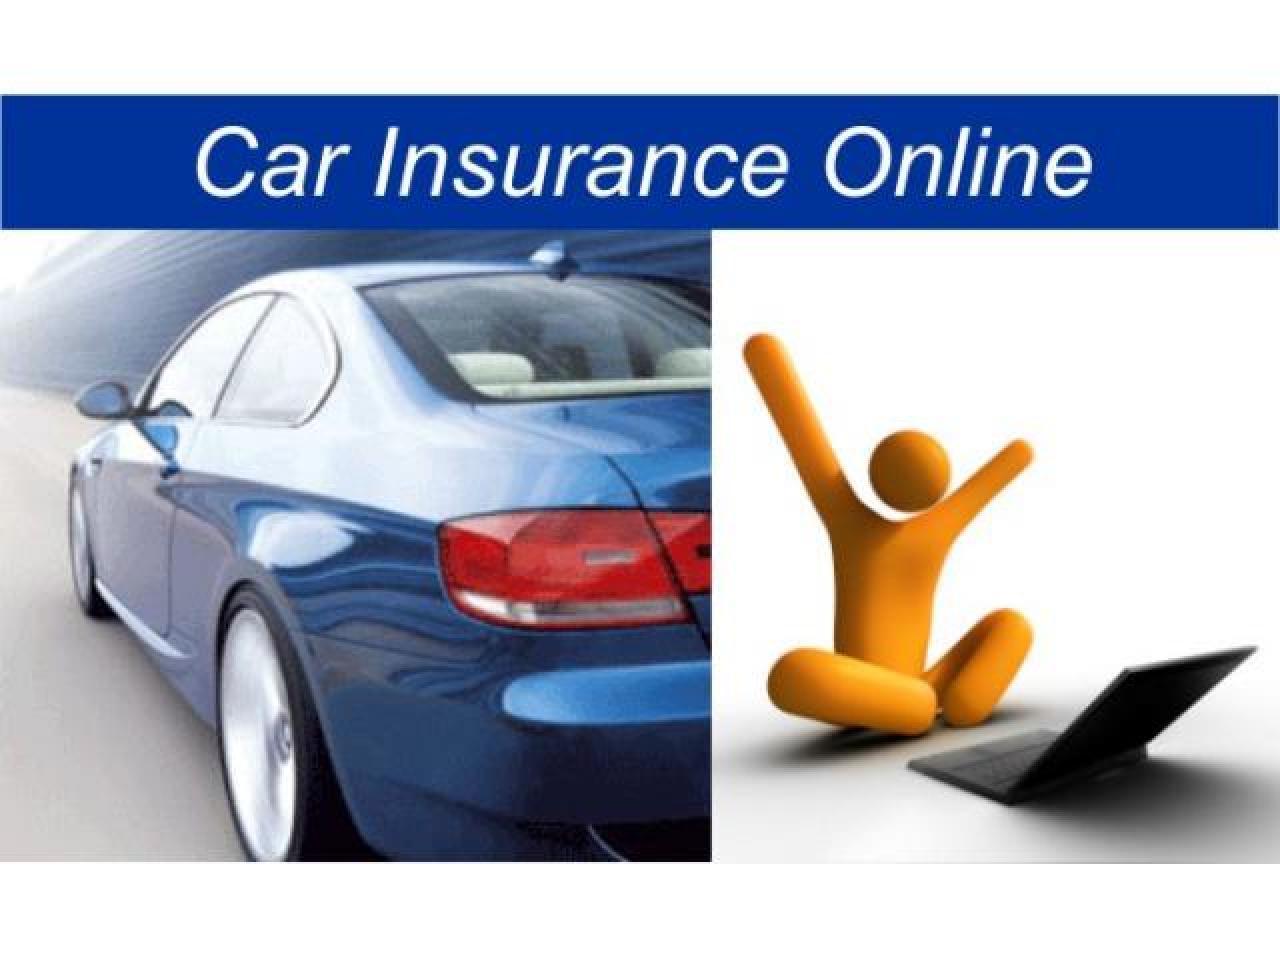 Car insurance - 1